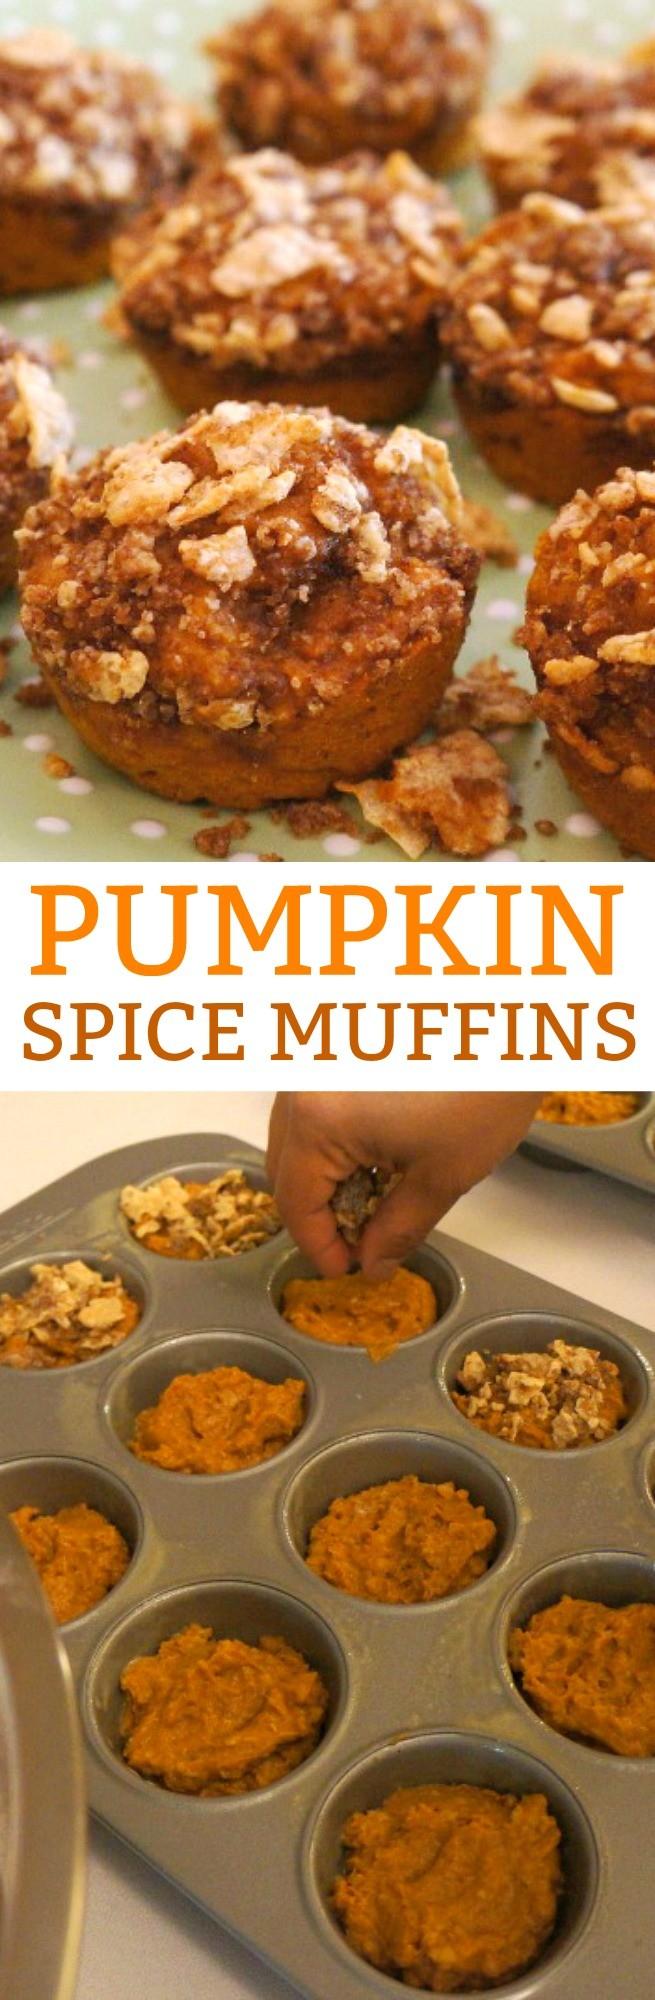 Fall Favorites- Streusel Topped Pumpkin Spice Muffins Recipe